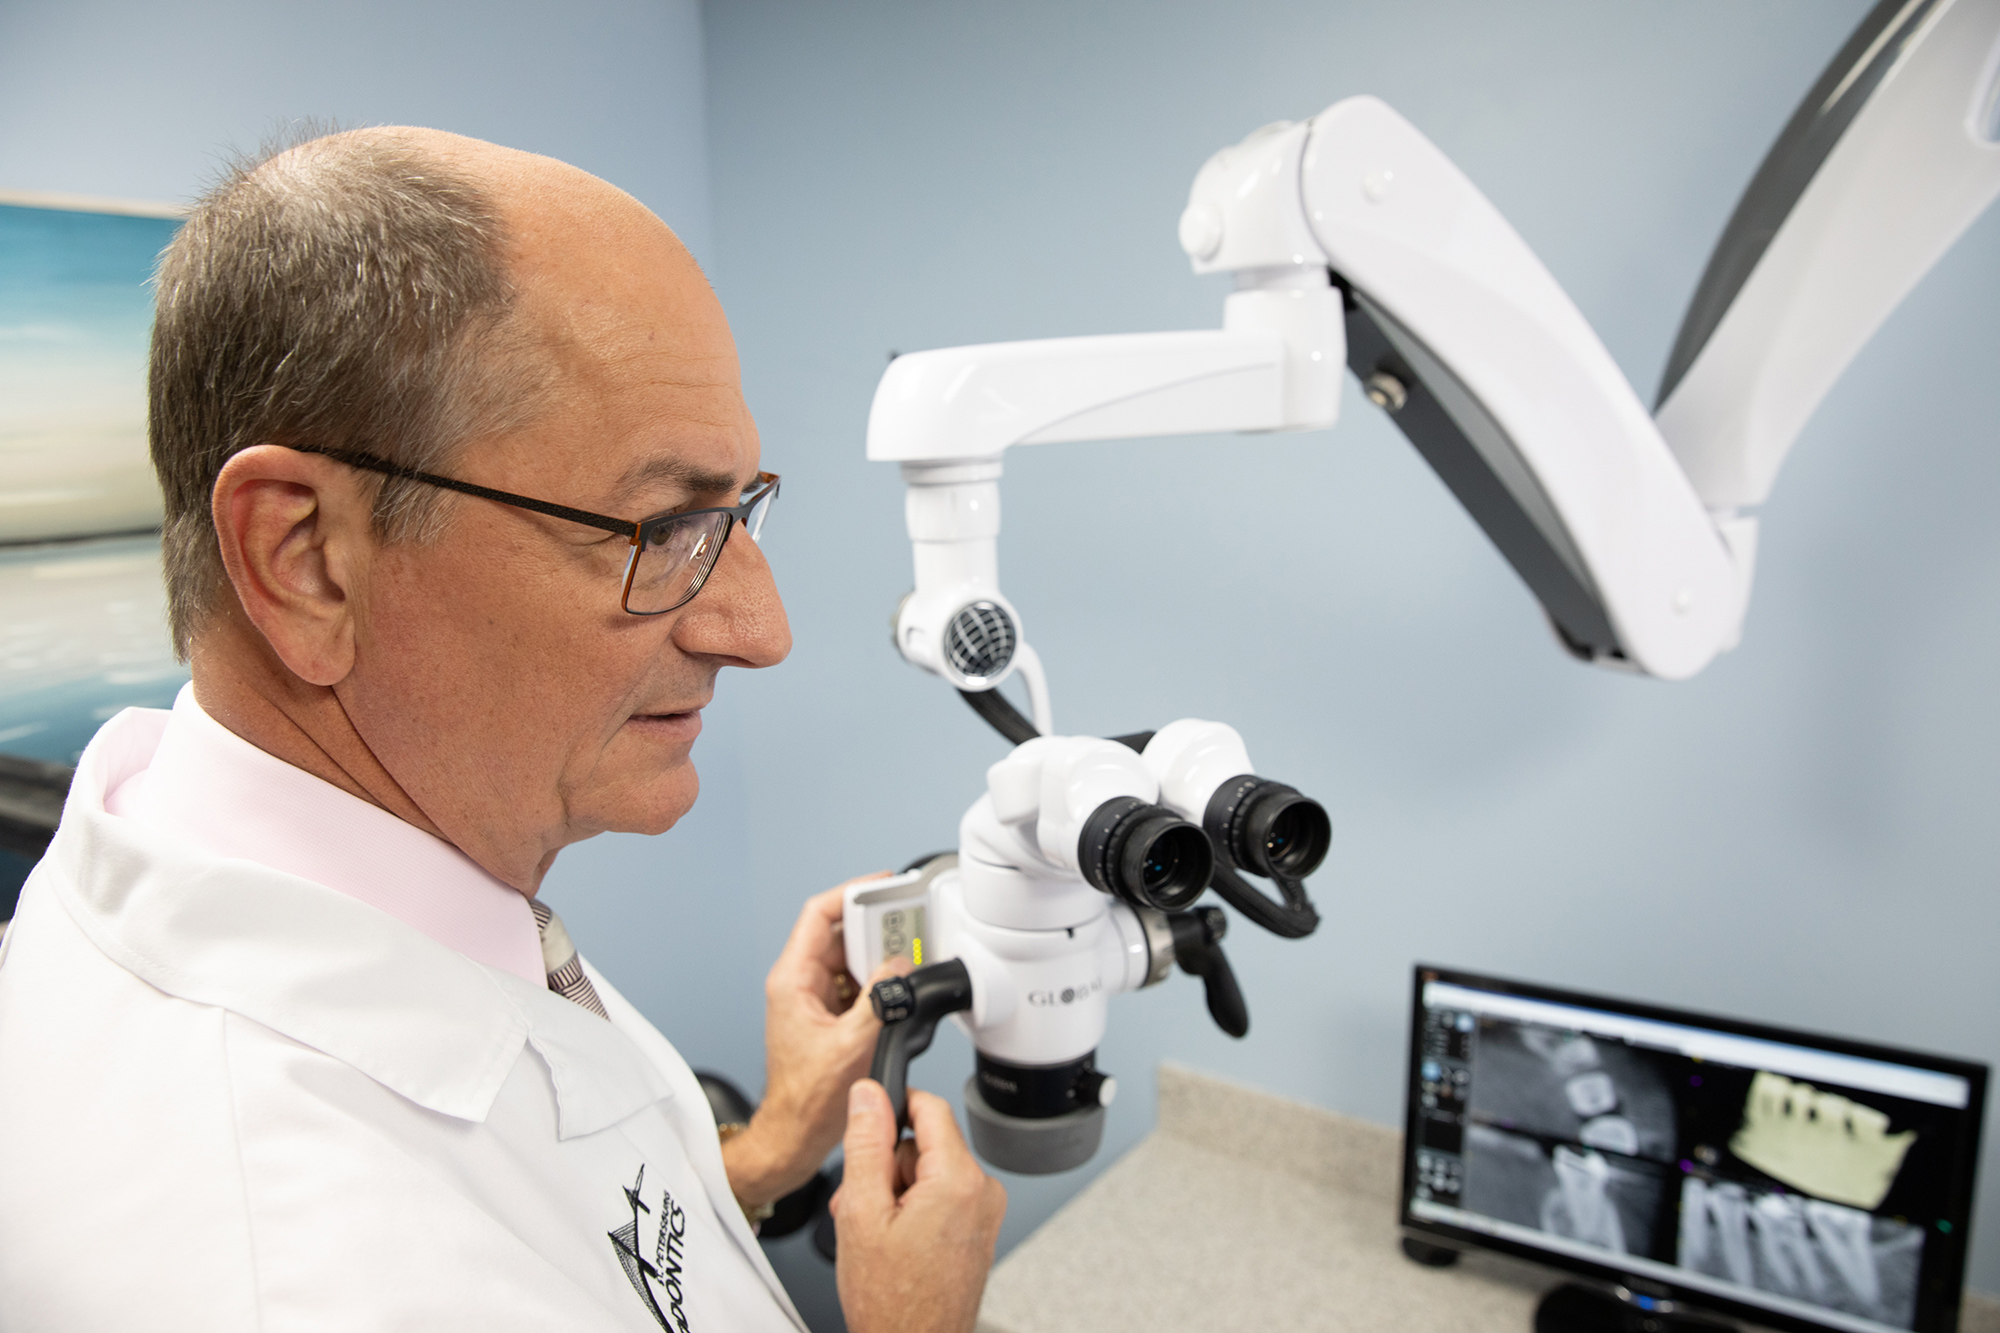 microscope for endo